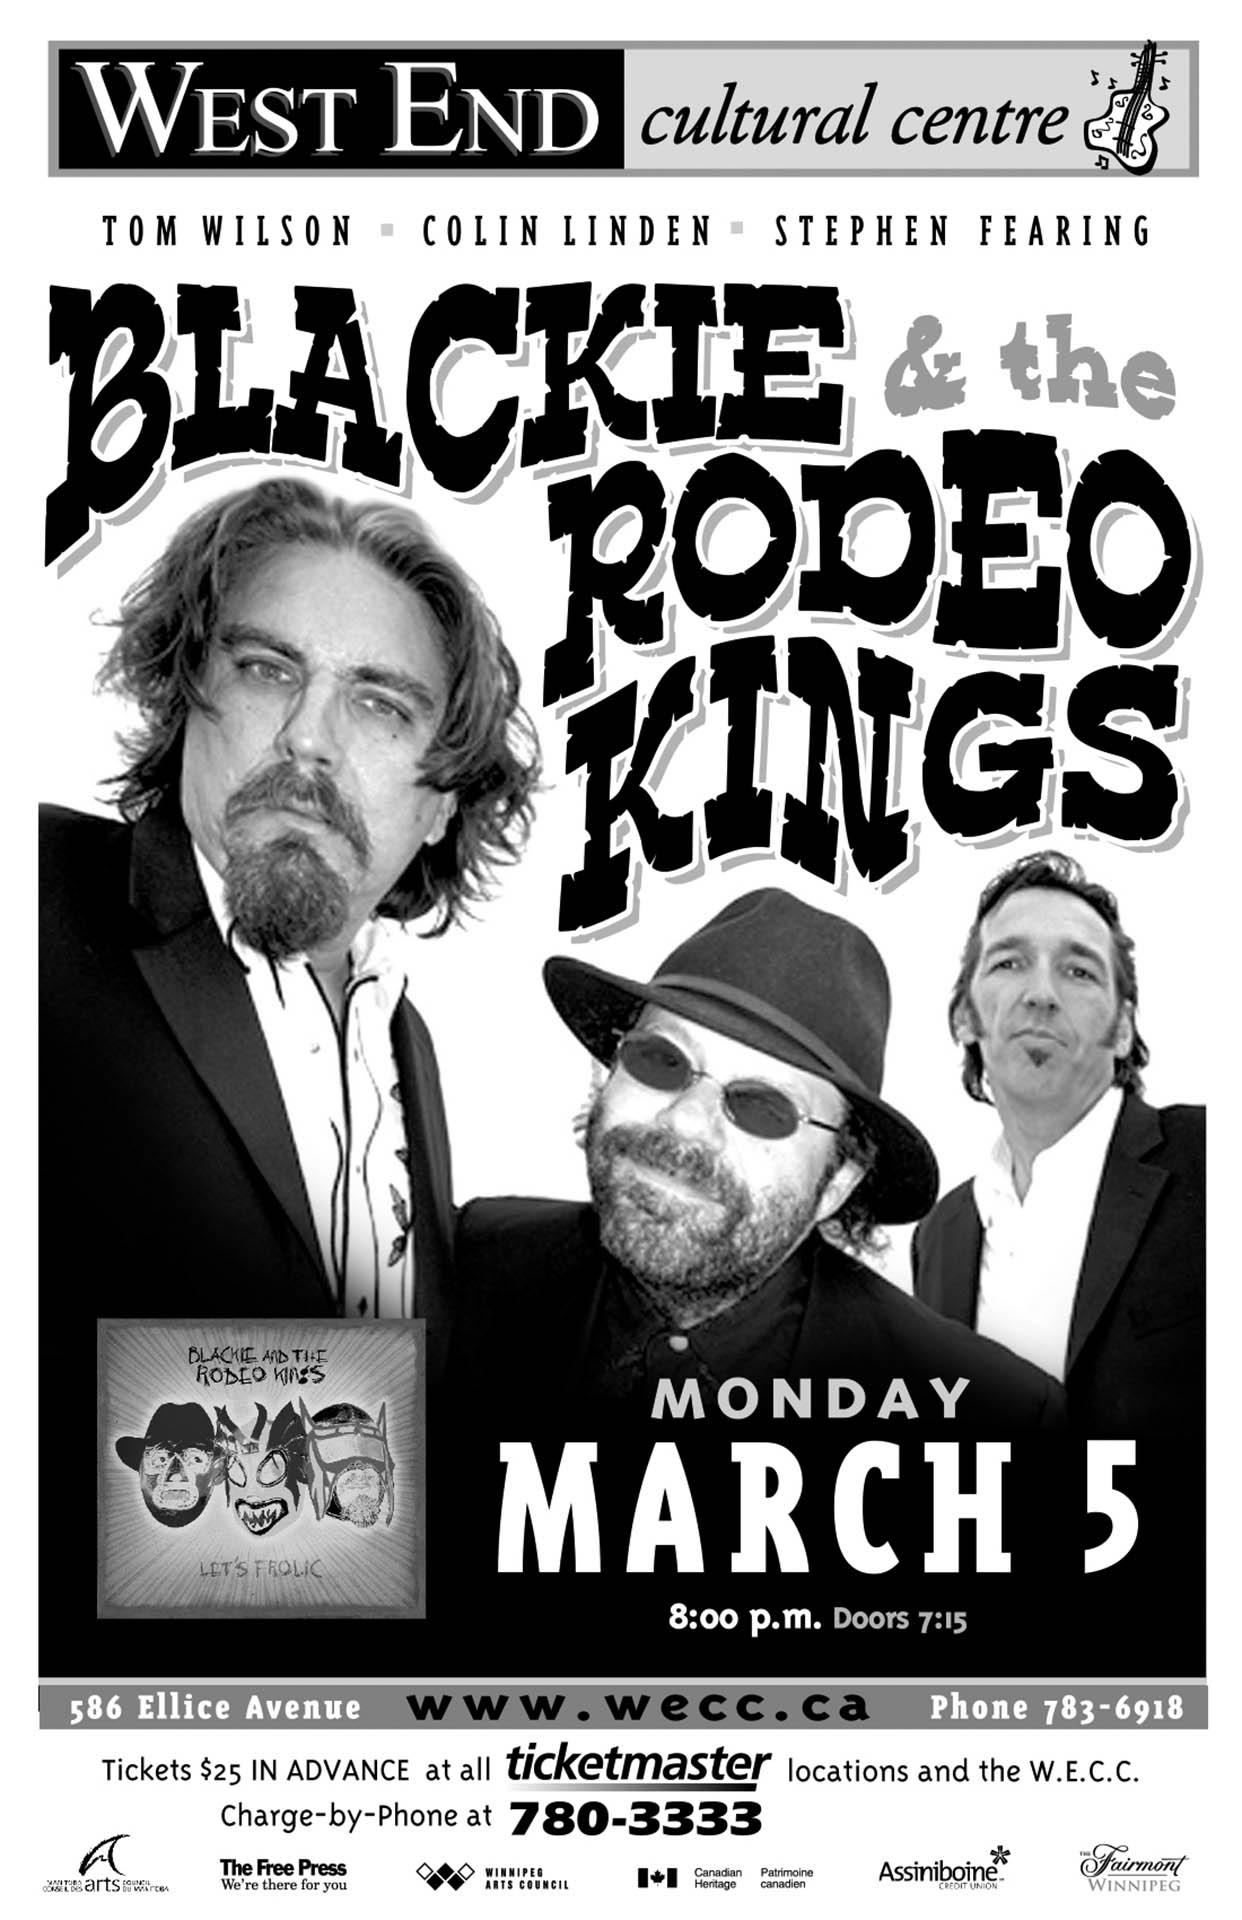 BLACKIE & THE RODEO KINGS – 2007